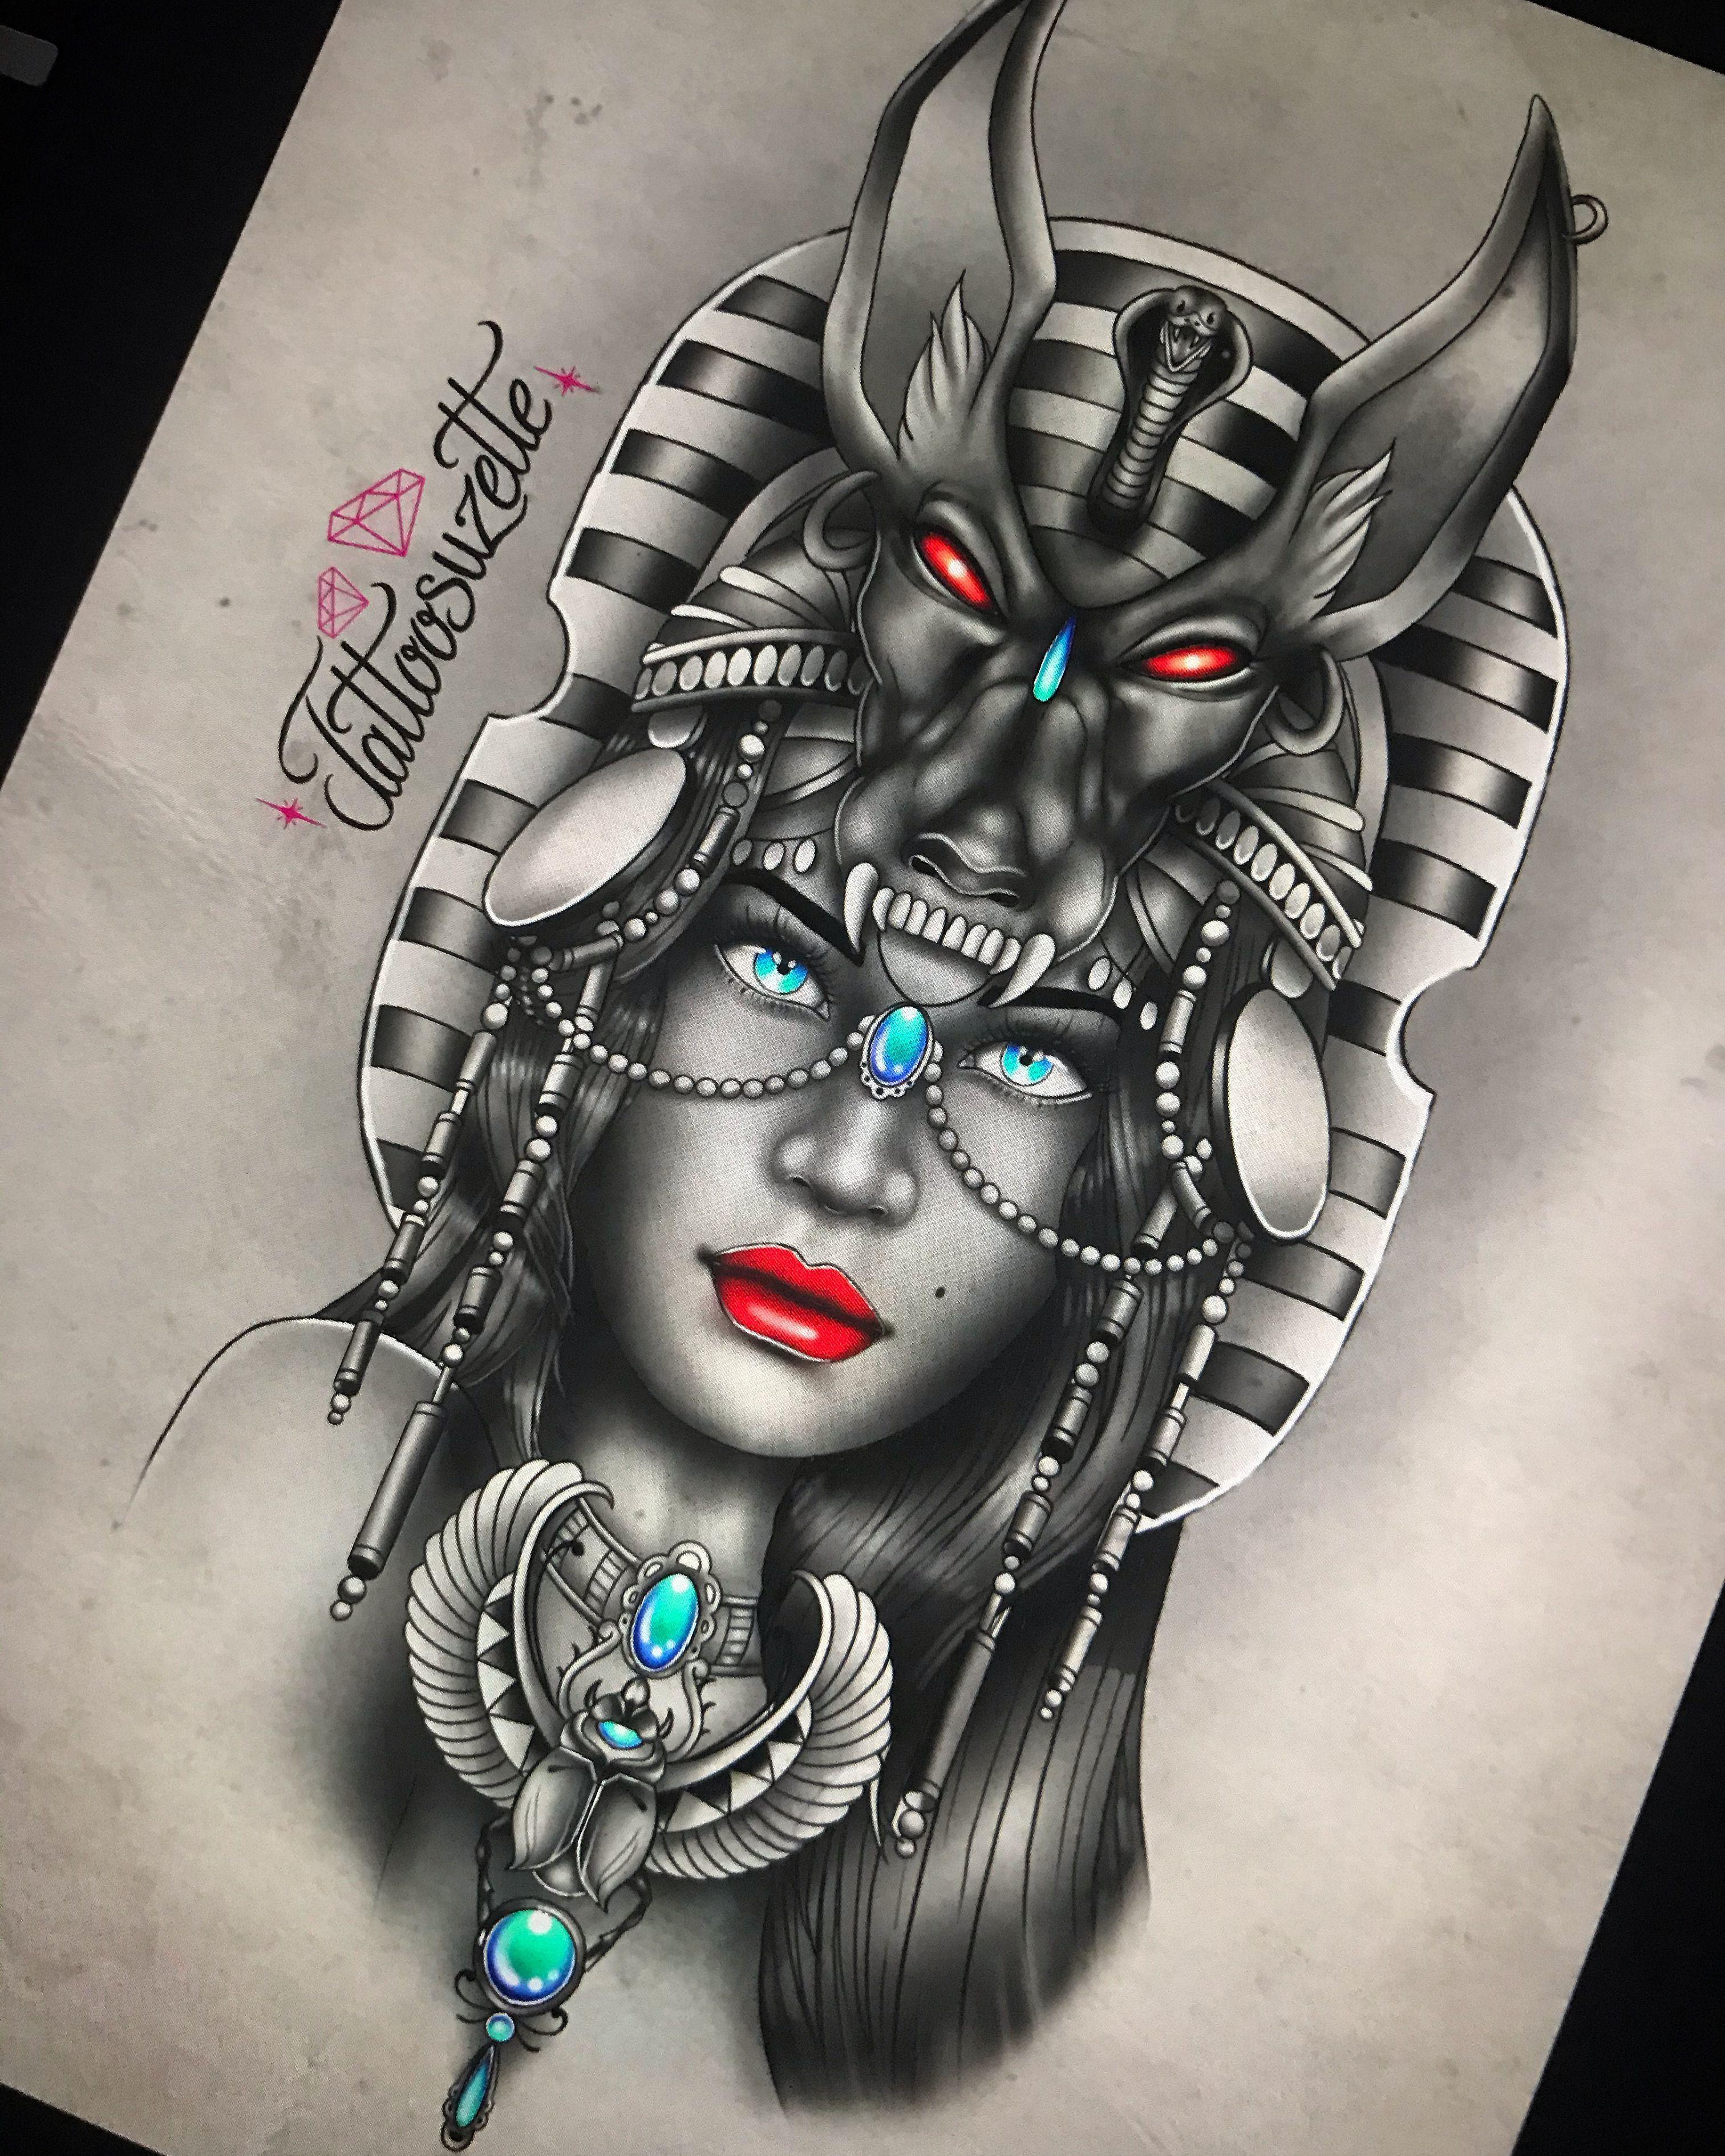 Egyptian Tattoo Design In 2020 Egyptian Tattoo Egypt Tattoo Design Tattoos